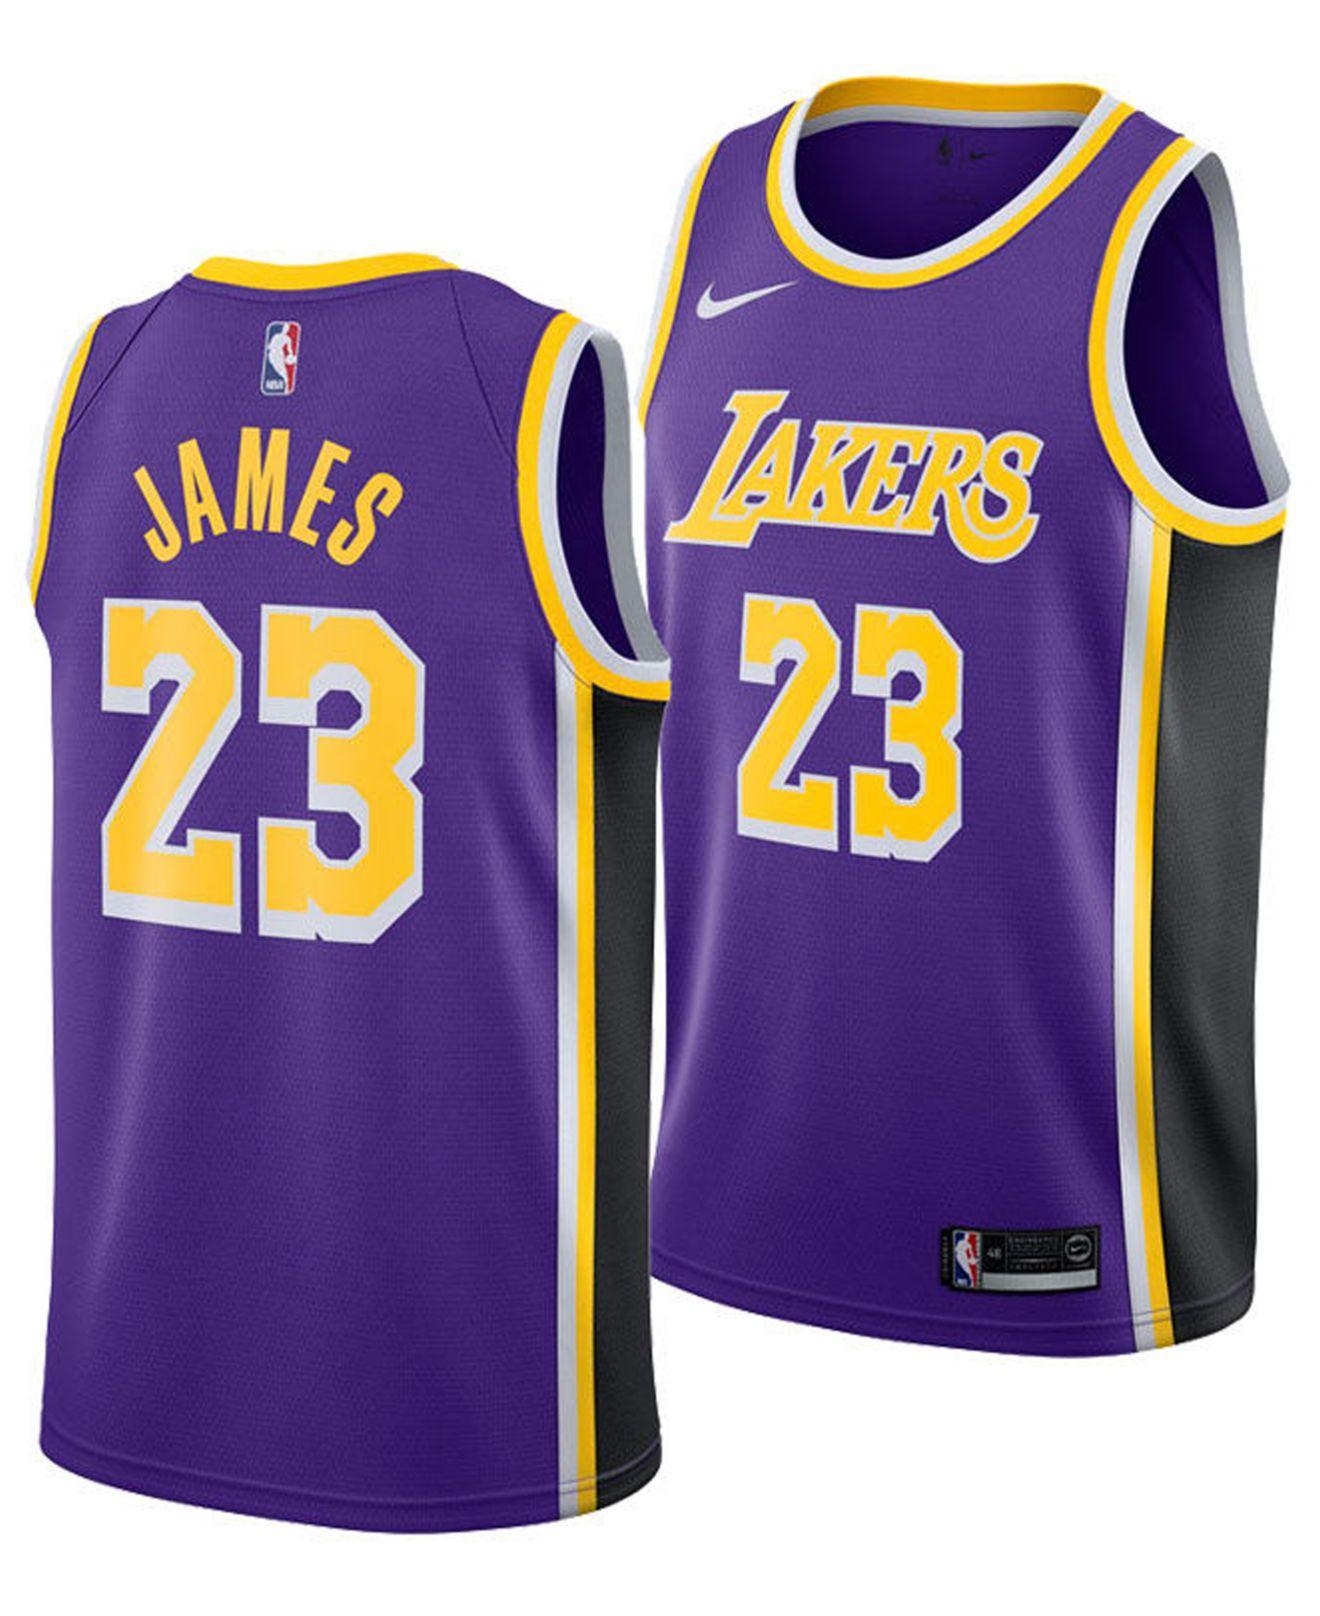 sale retailer 708d2 67224 Men's Purple Nba Swingman Basketball Jersey